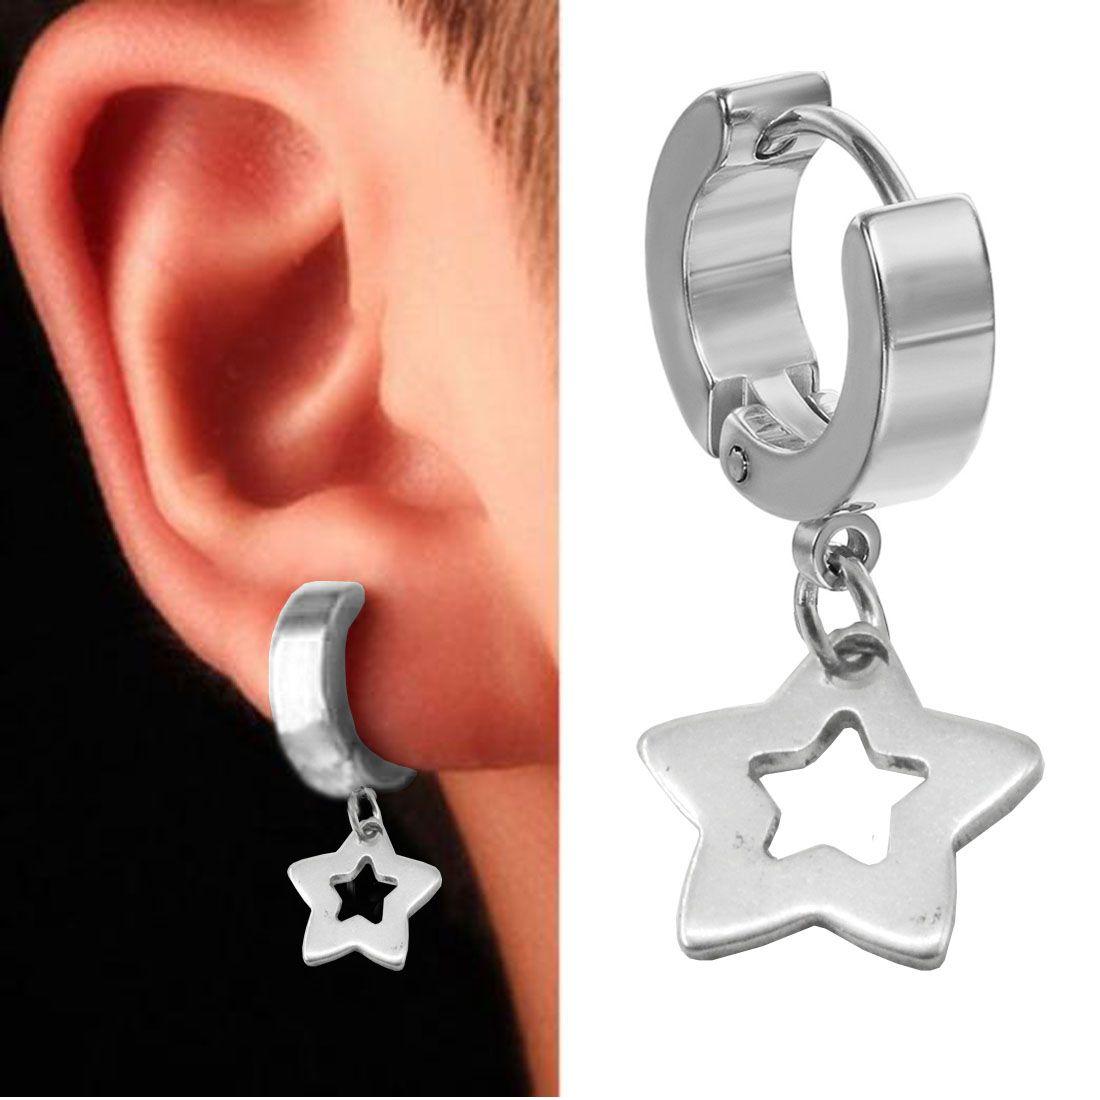 3e713162f ... Sullery New Arrival Star Silver Stainless Steel Drops Earring For Men  Women ...